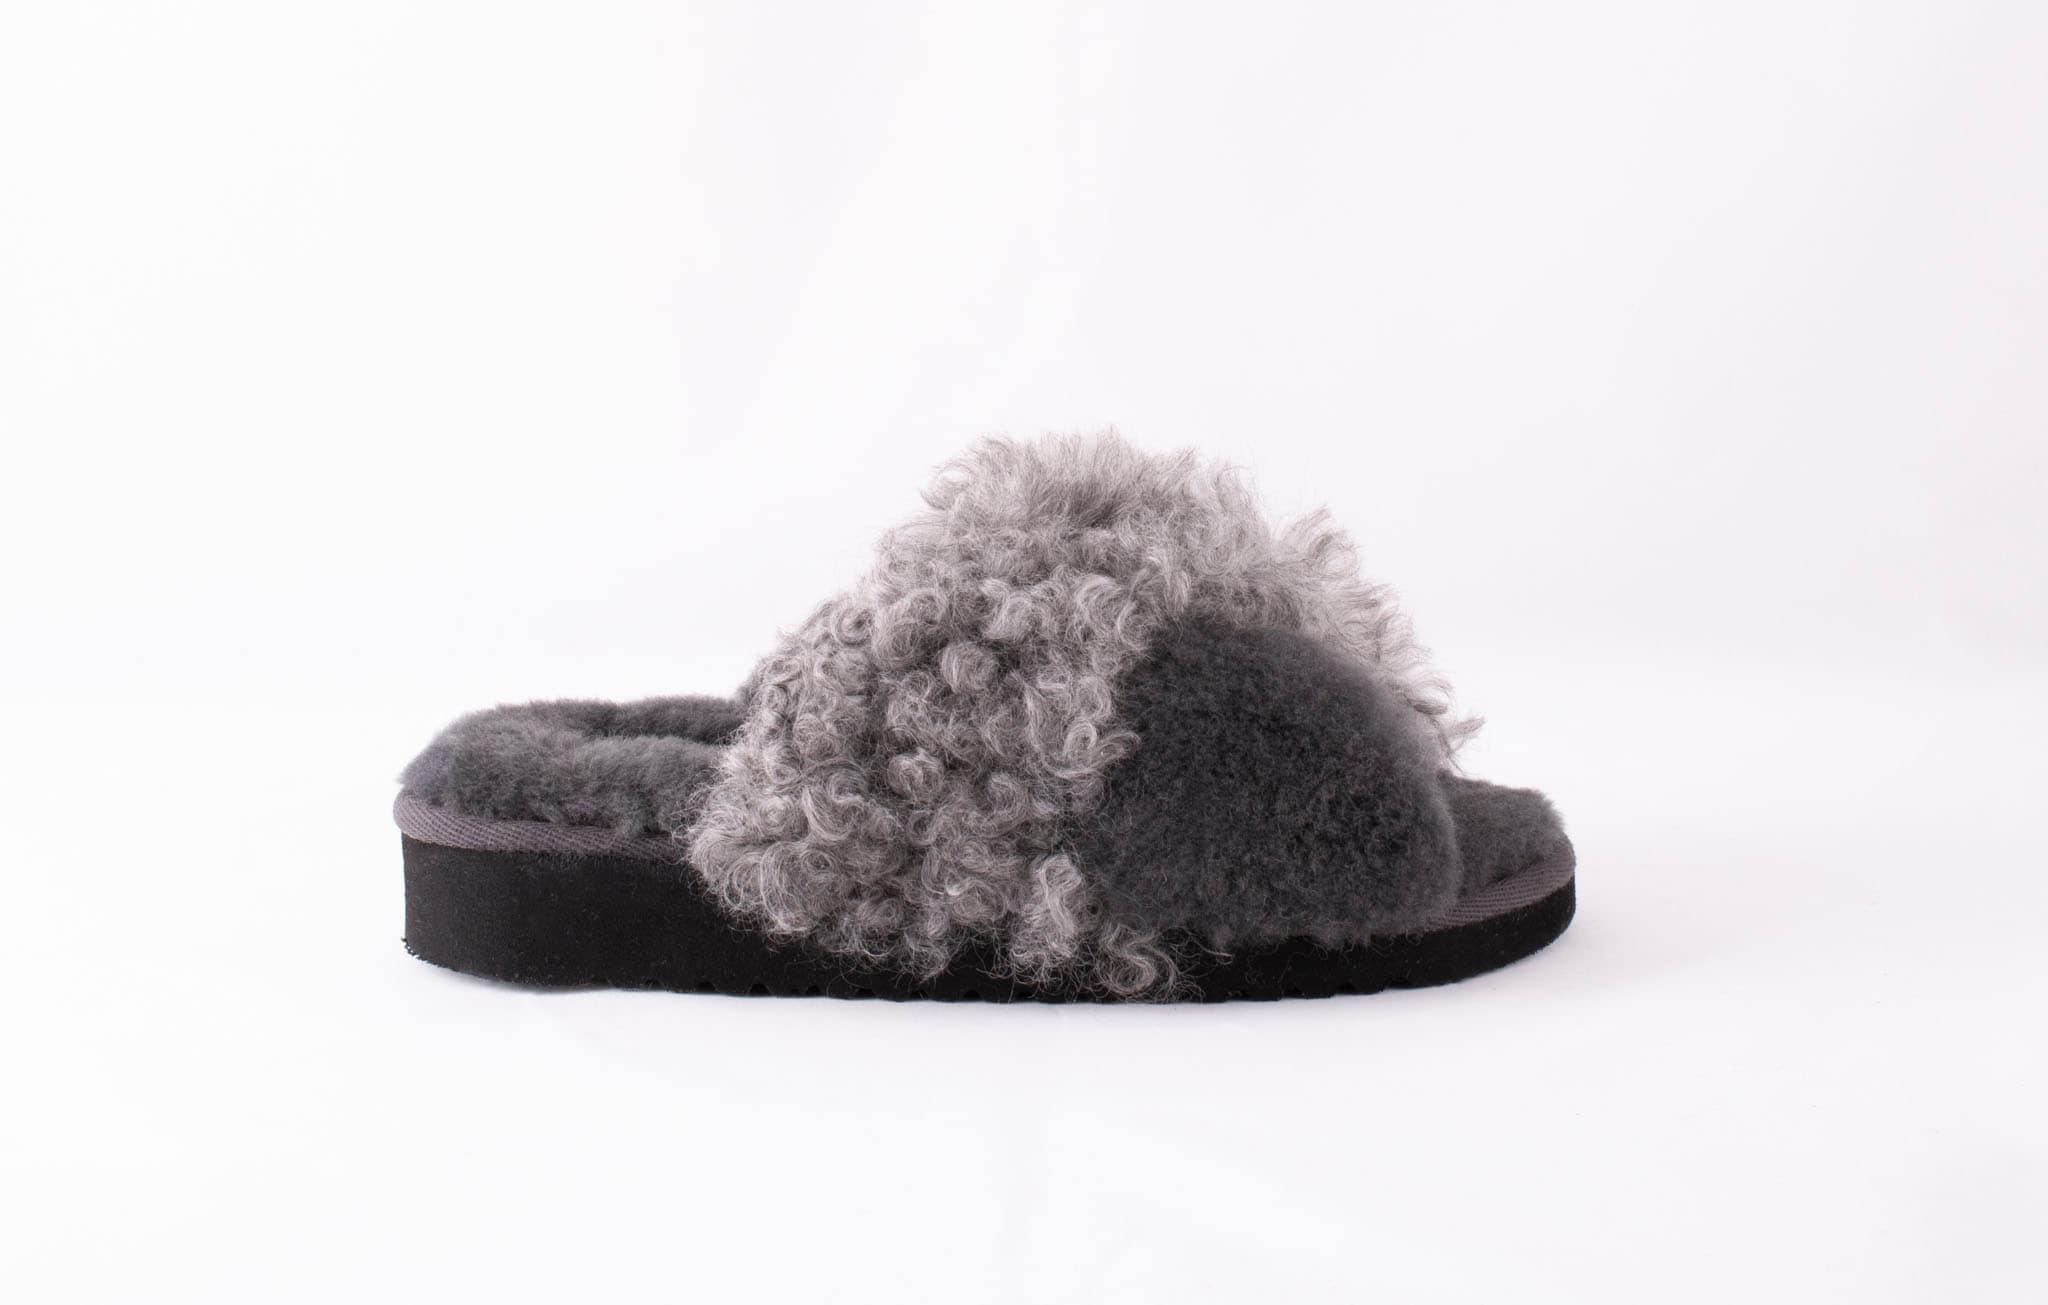 Millie sheepskin slippers